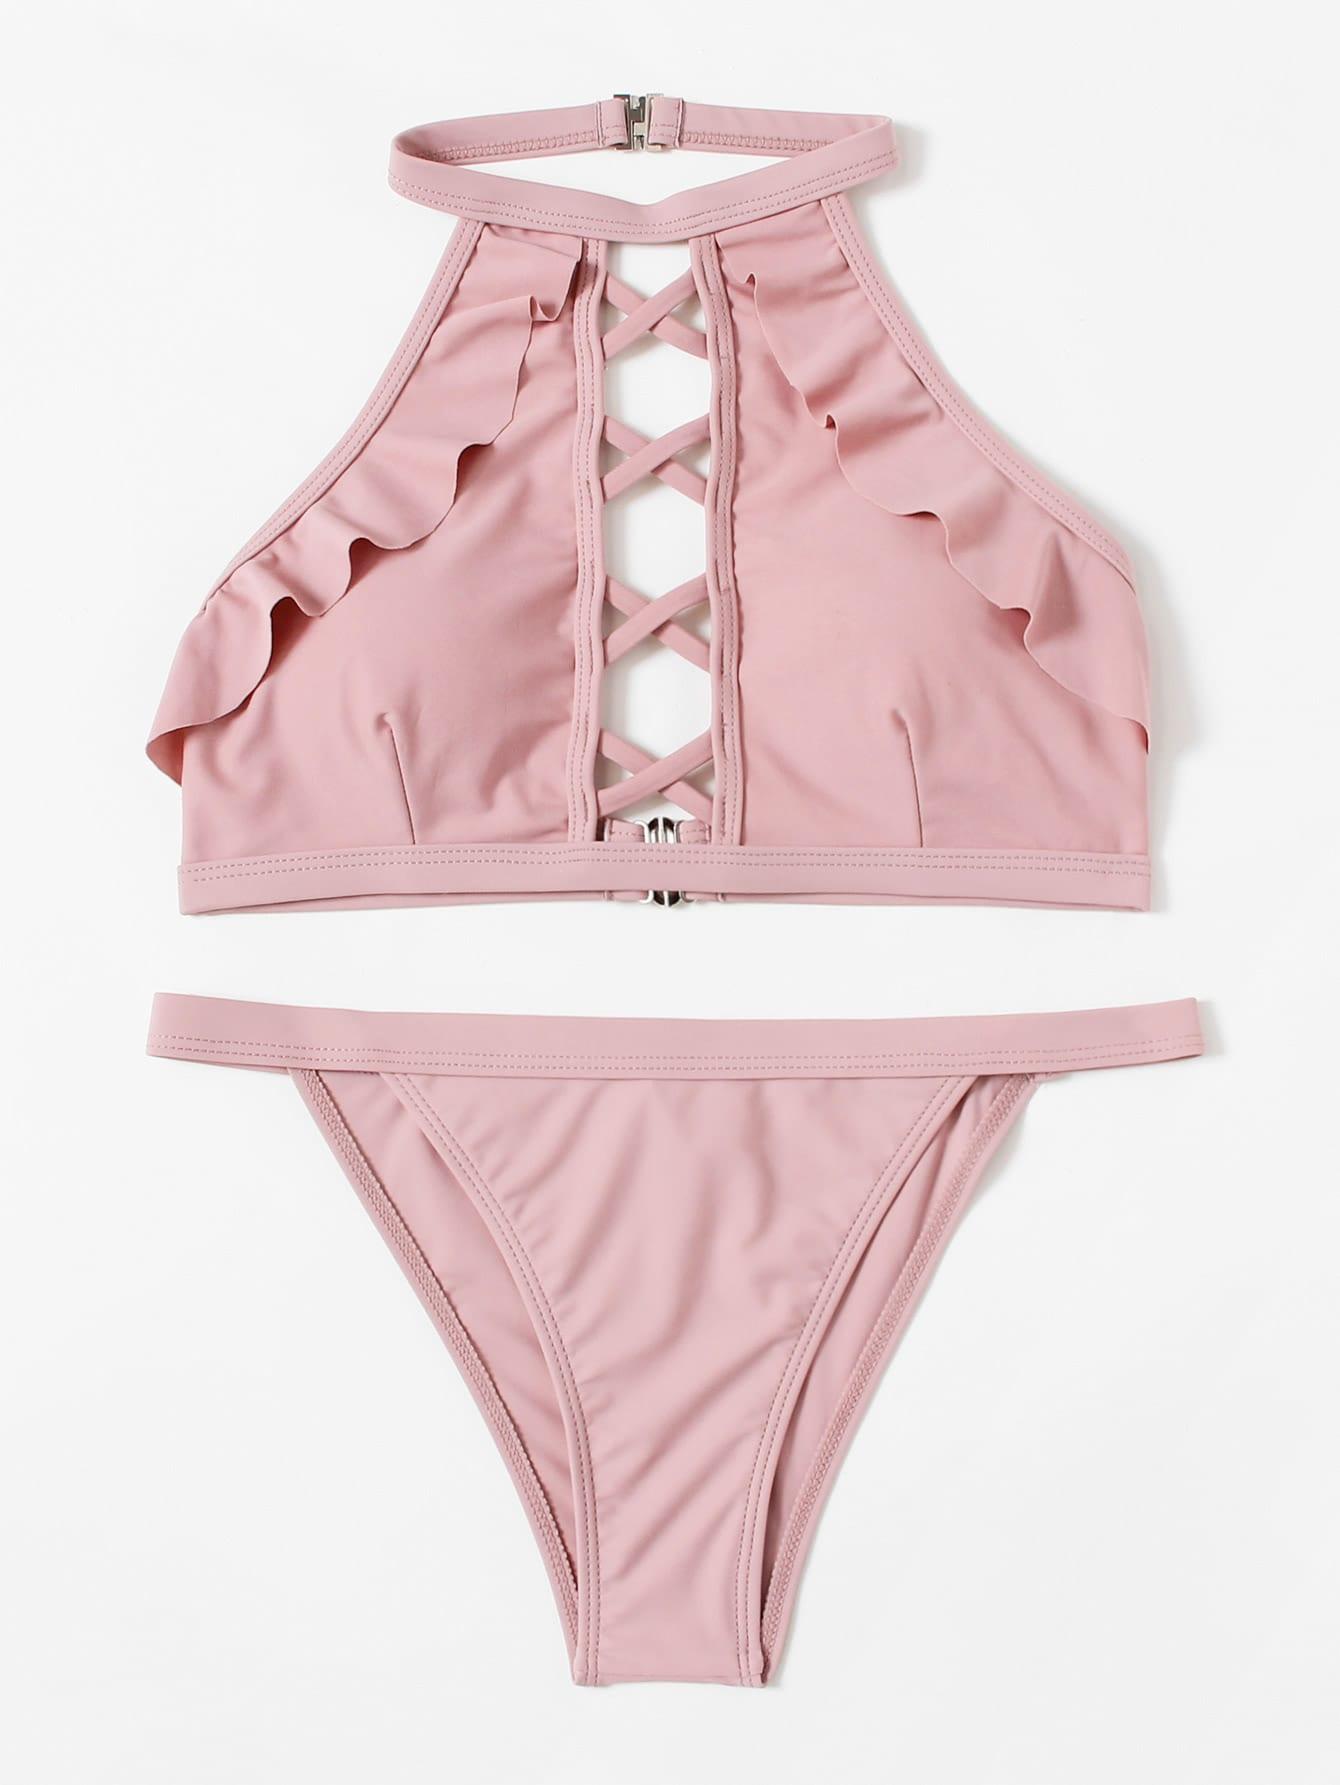 Criss Cross Ruffle Bikini Set criss cross ruffle bikini set